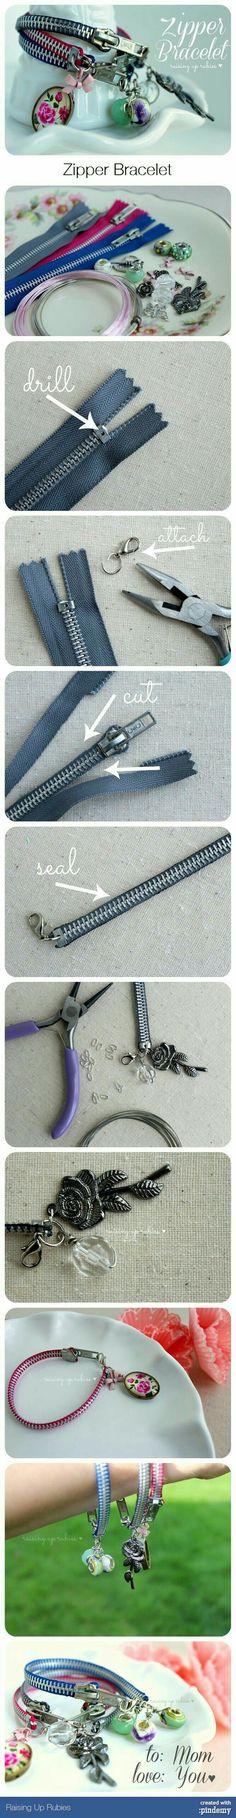 a zipper bracelet tutorial . Zipper Bracelet, Zipper Jewelry, Fabric Jewelry, Beaded Jewelry, Jewelry Bracelets, Bracelet Making, Jewelry Making, Zipper Crafts, Homemade Jewelry